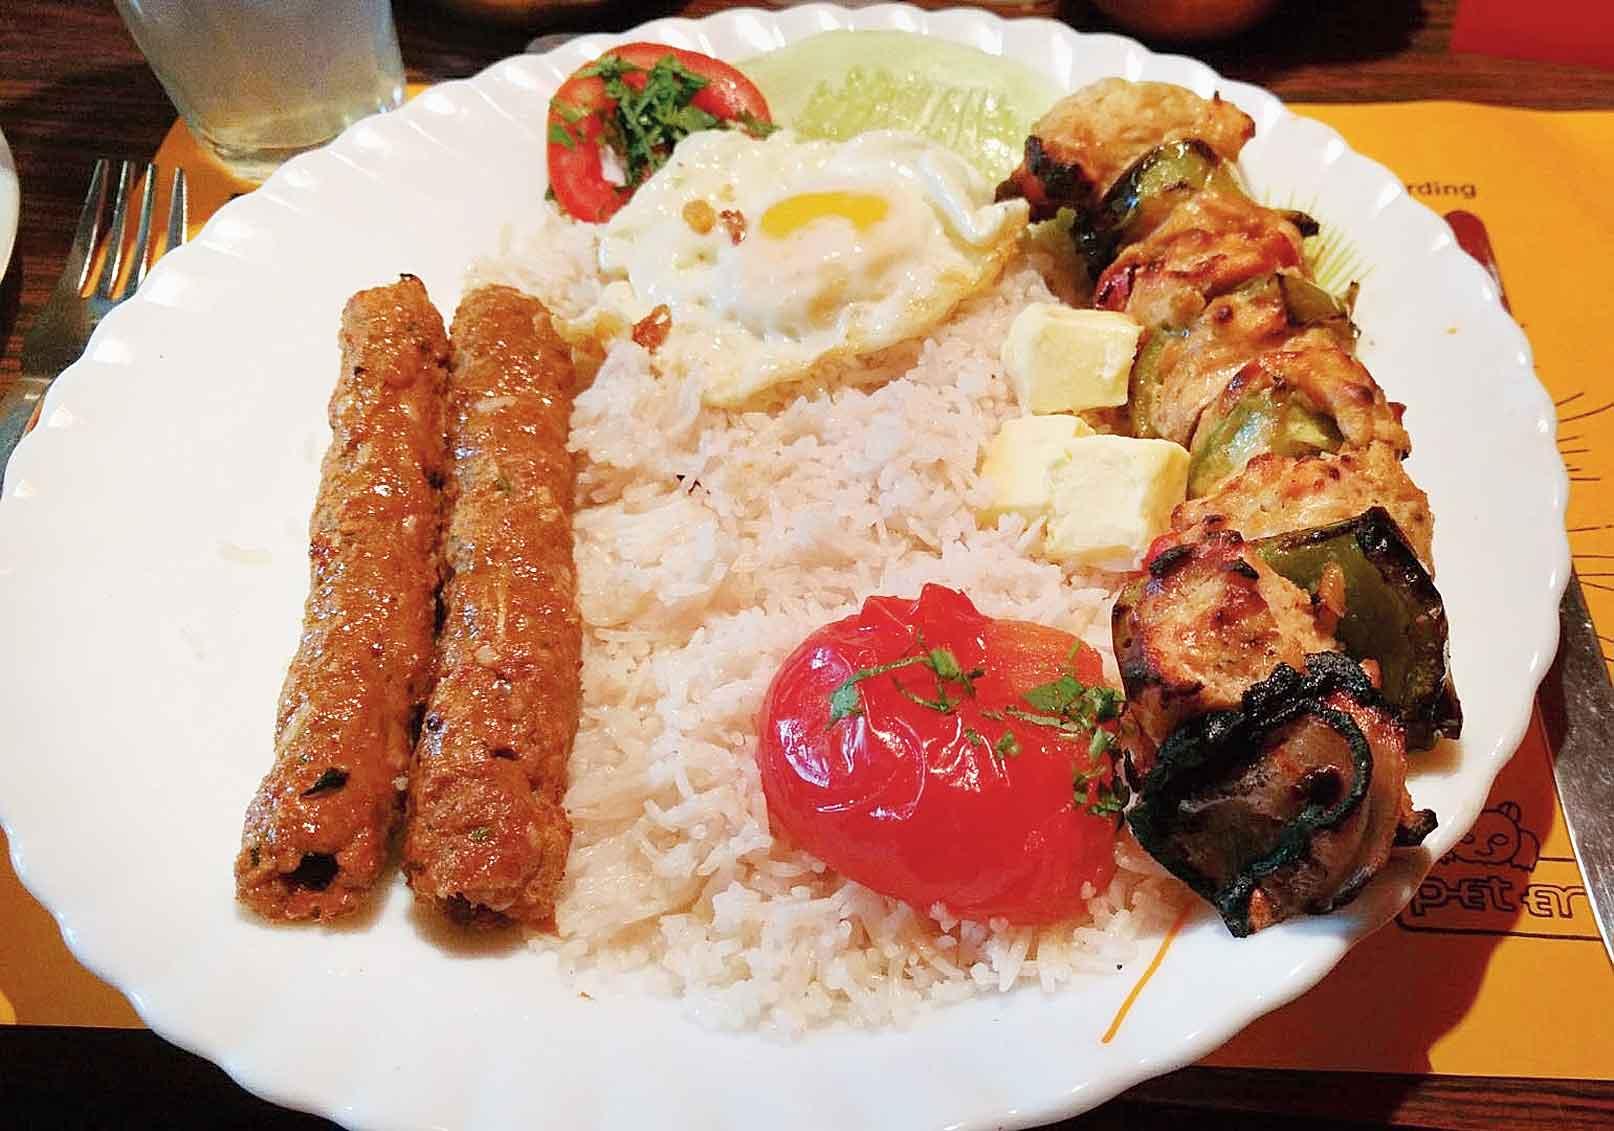 From Iran's platter